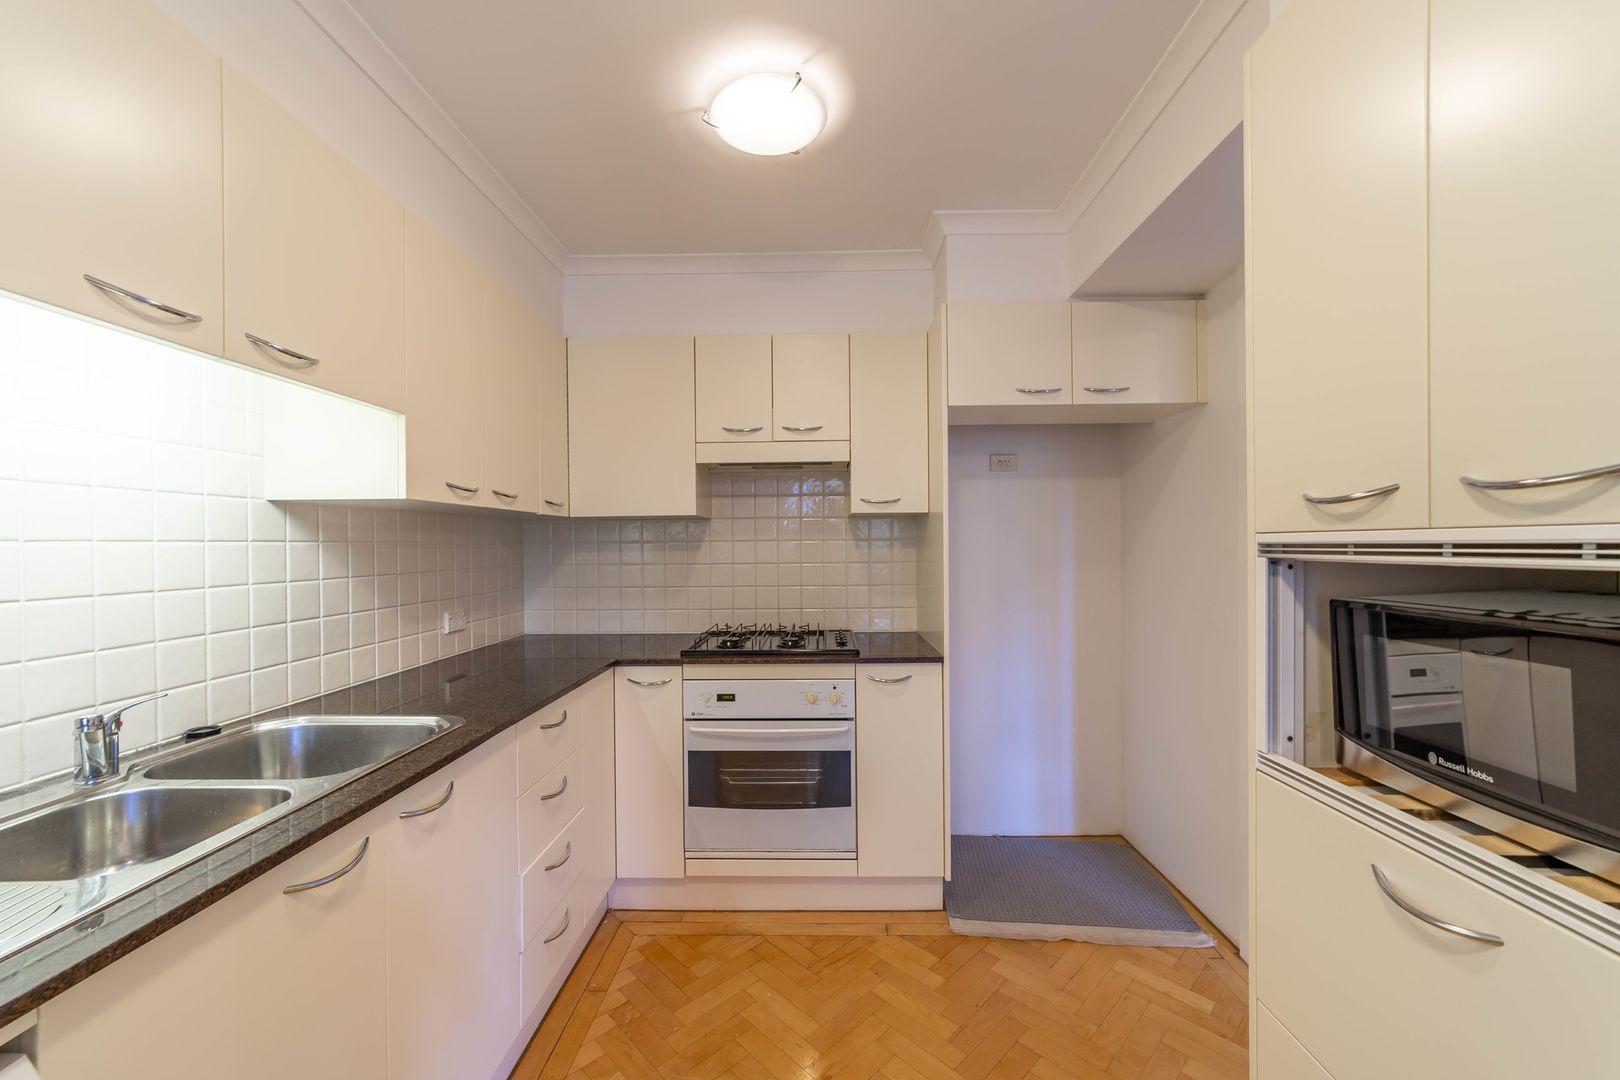 70/47 lithgow street, St Leonards NSW 2065, Image 1